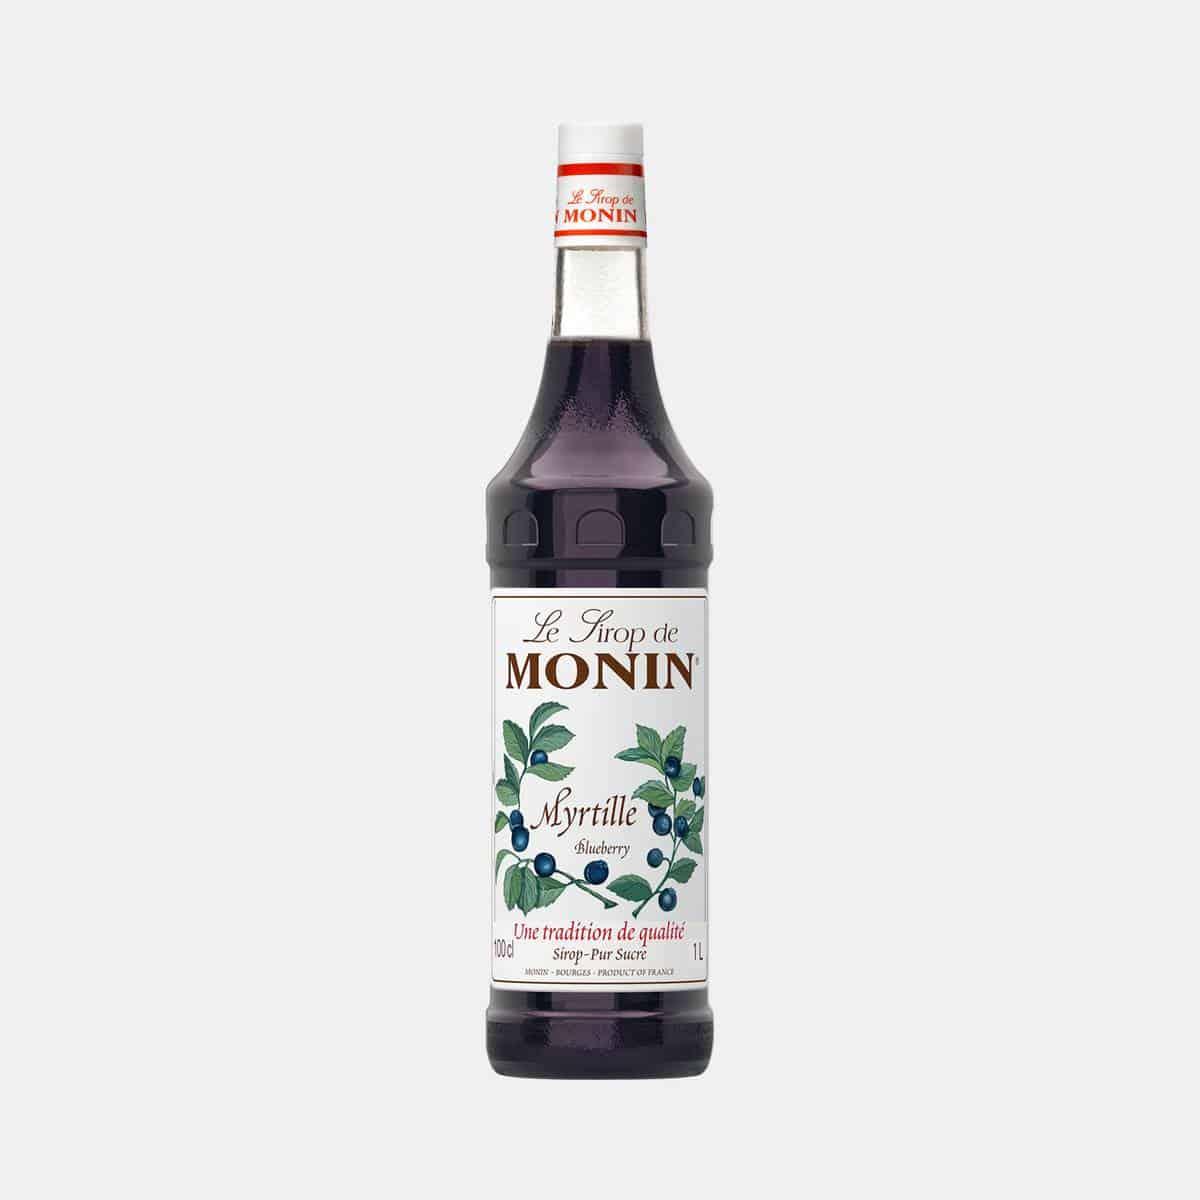 Monin Blueberry Syrup 1 Liter Glass Bottle